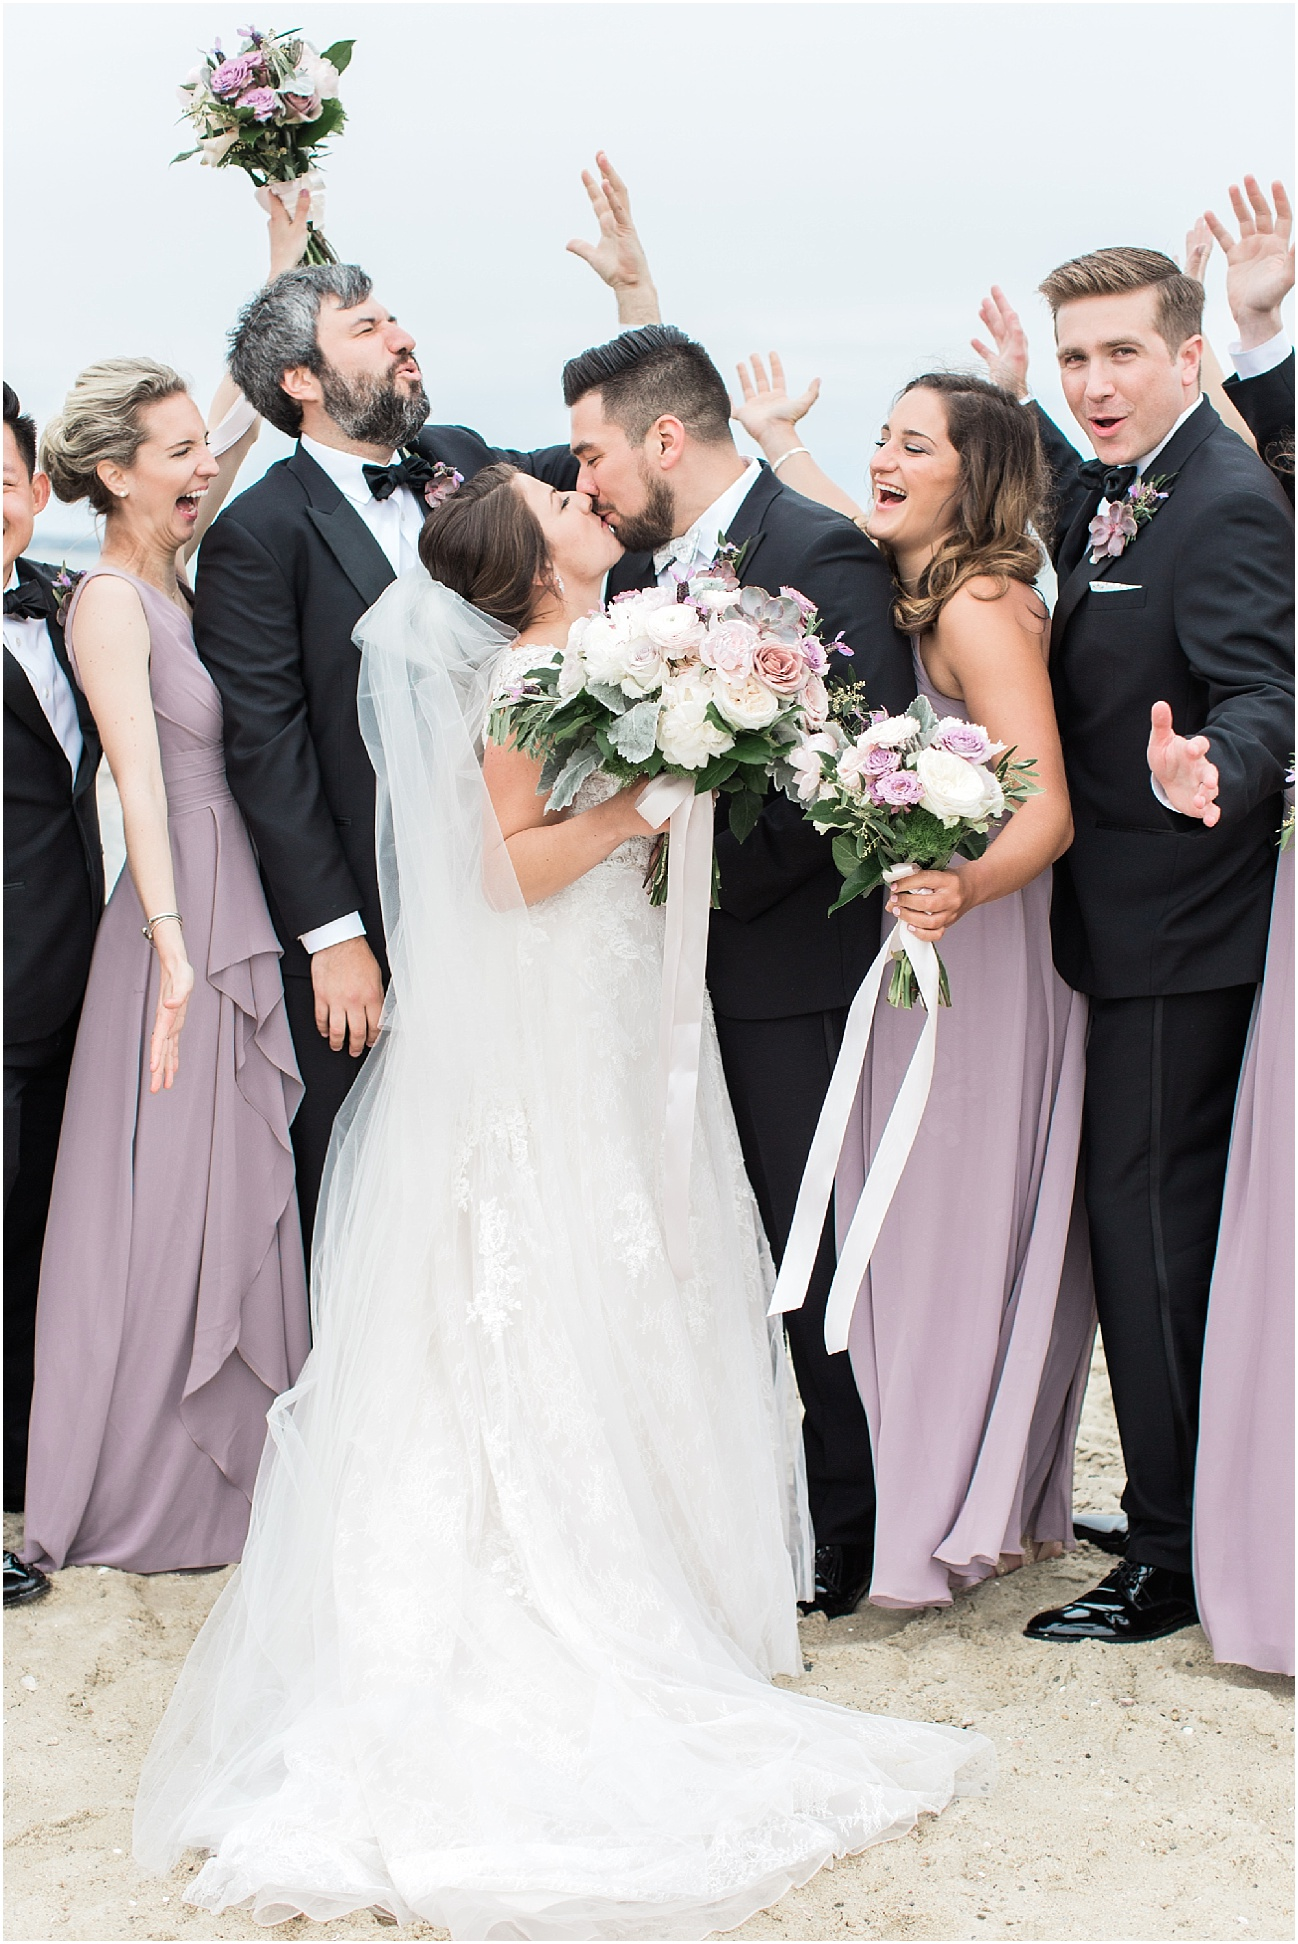 courtney_kurt_cape_cod_popponessett_inn_dowses_beach_boston_wedding_meredith_jane_photography_photo_0050.jpg